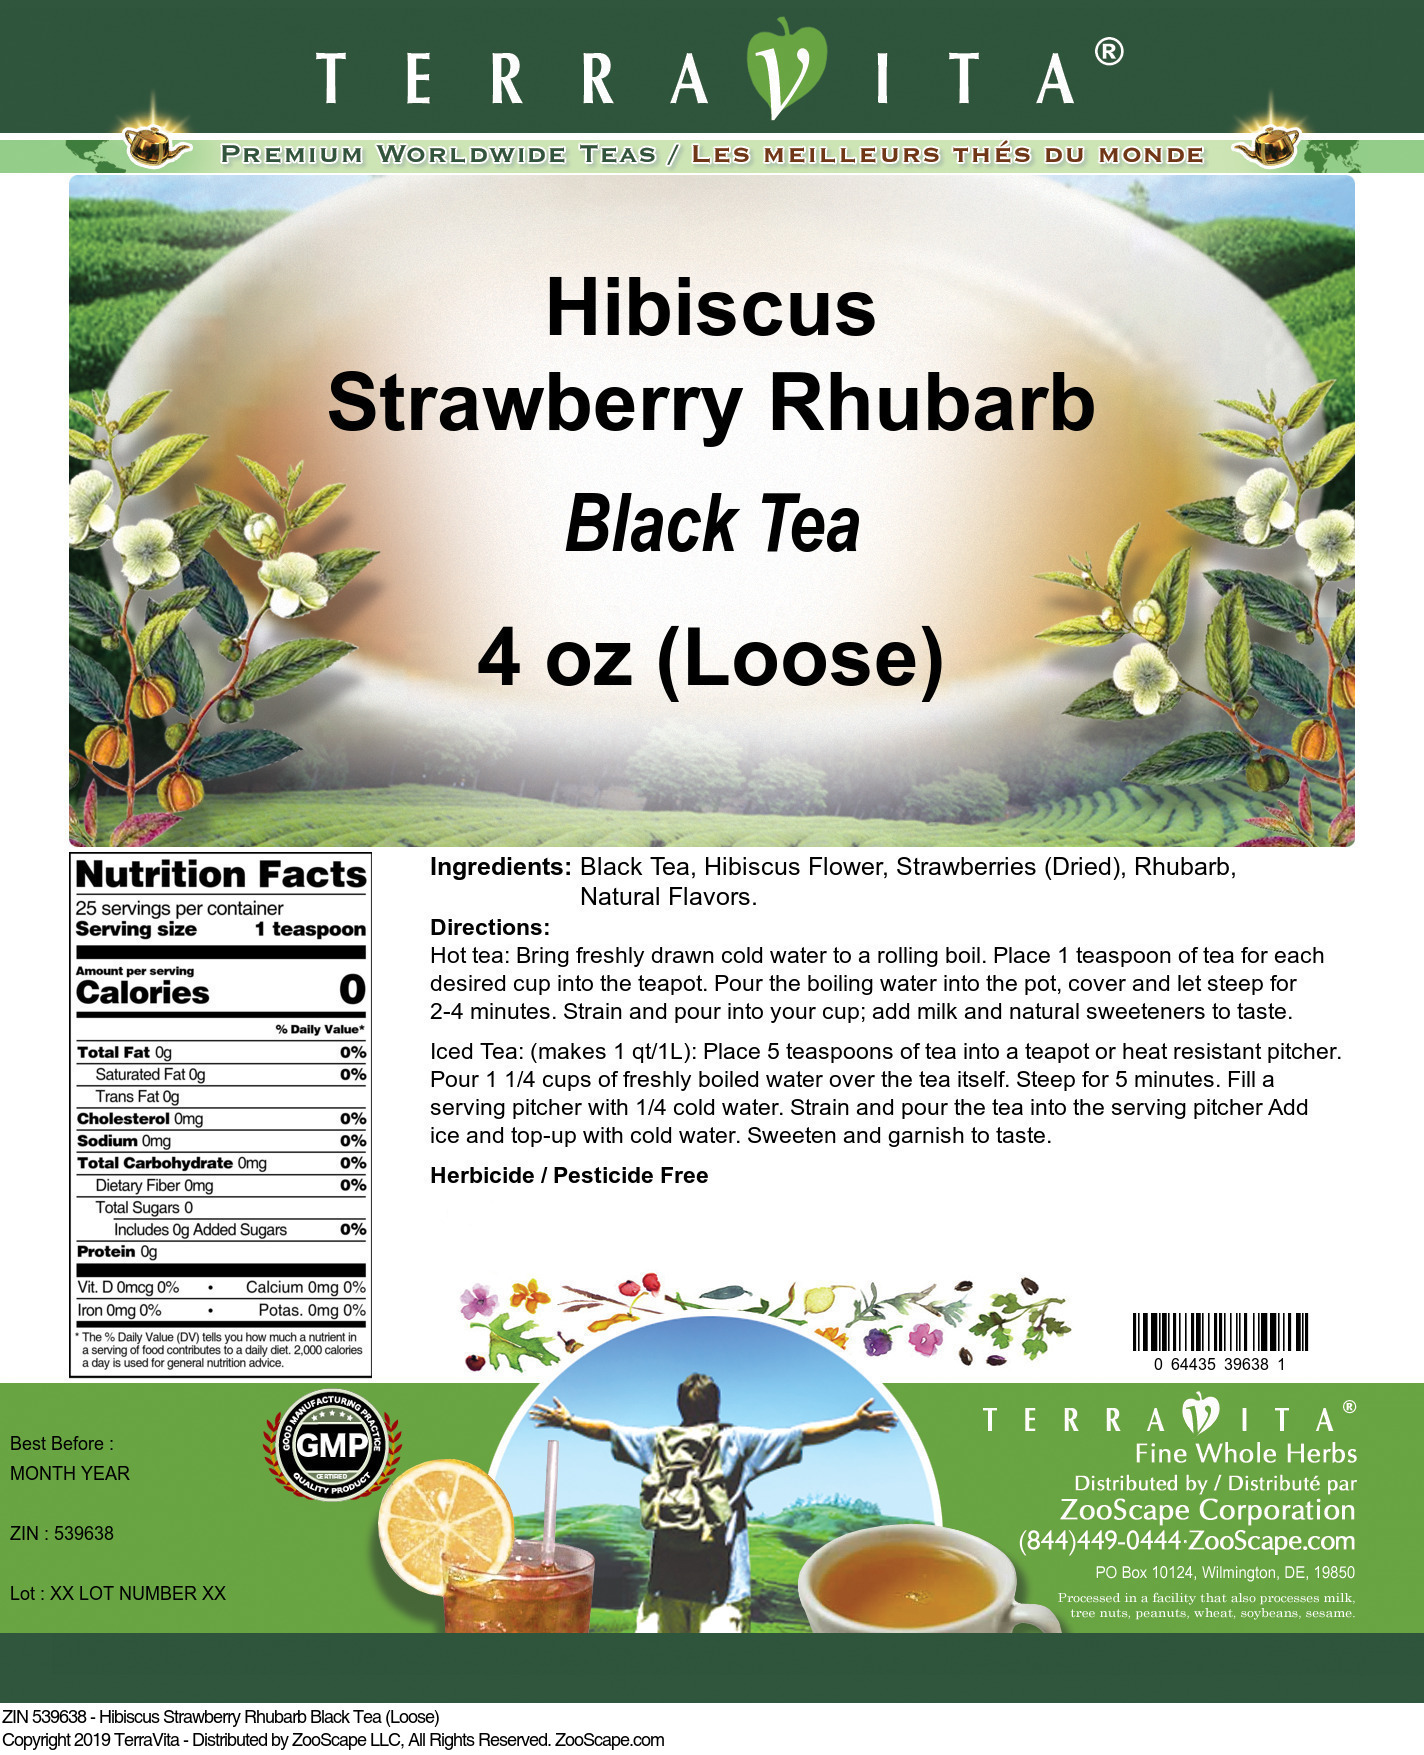 Hibiscus Strawberry Rhubarb Black Tea (Loose)